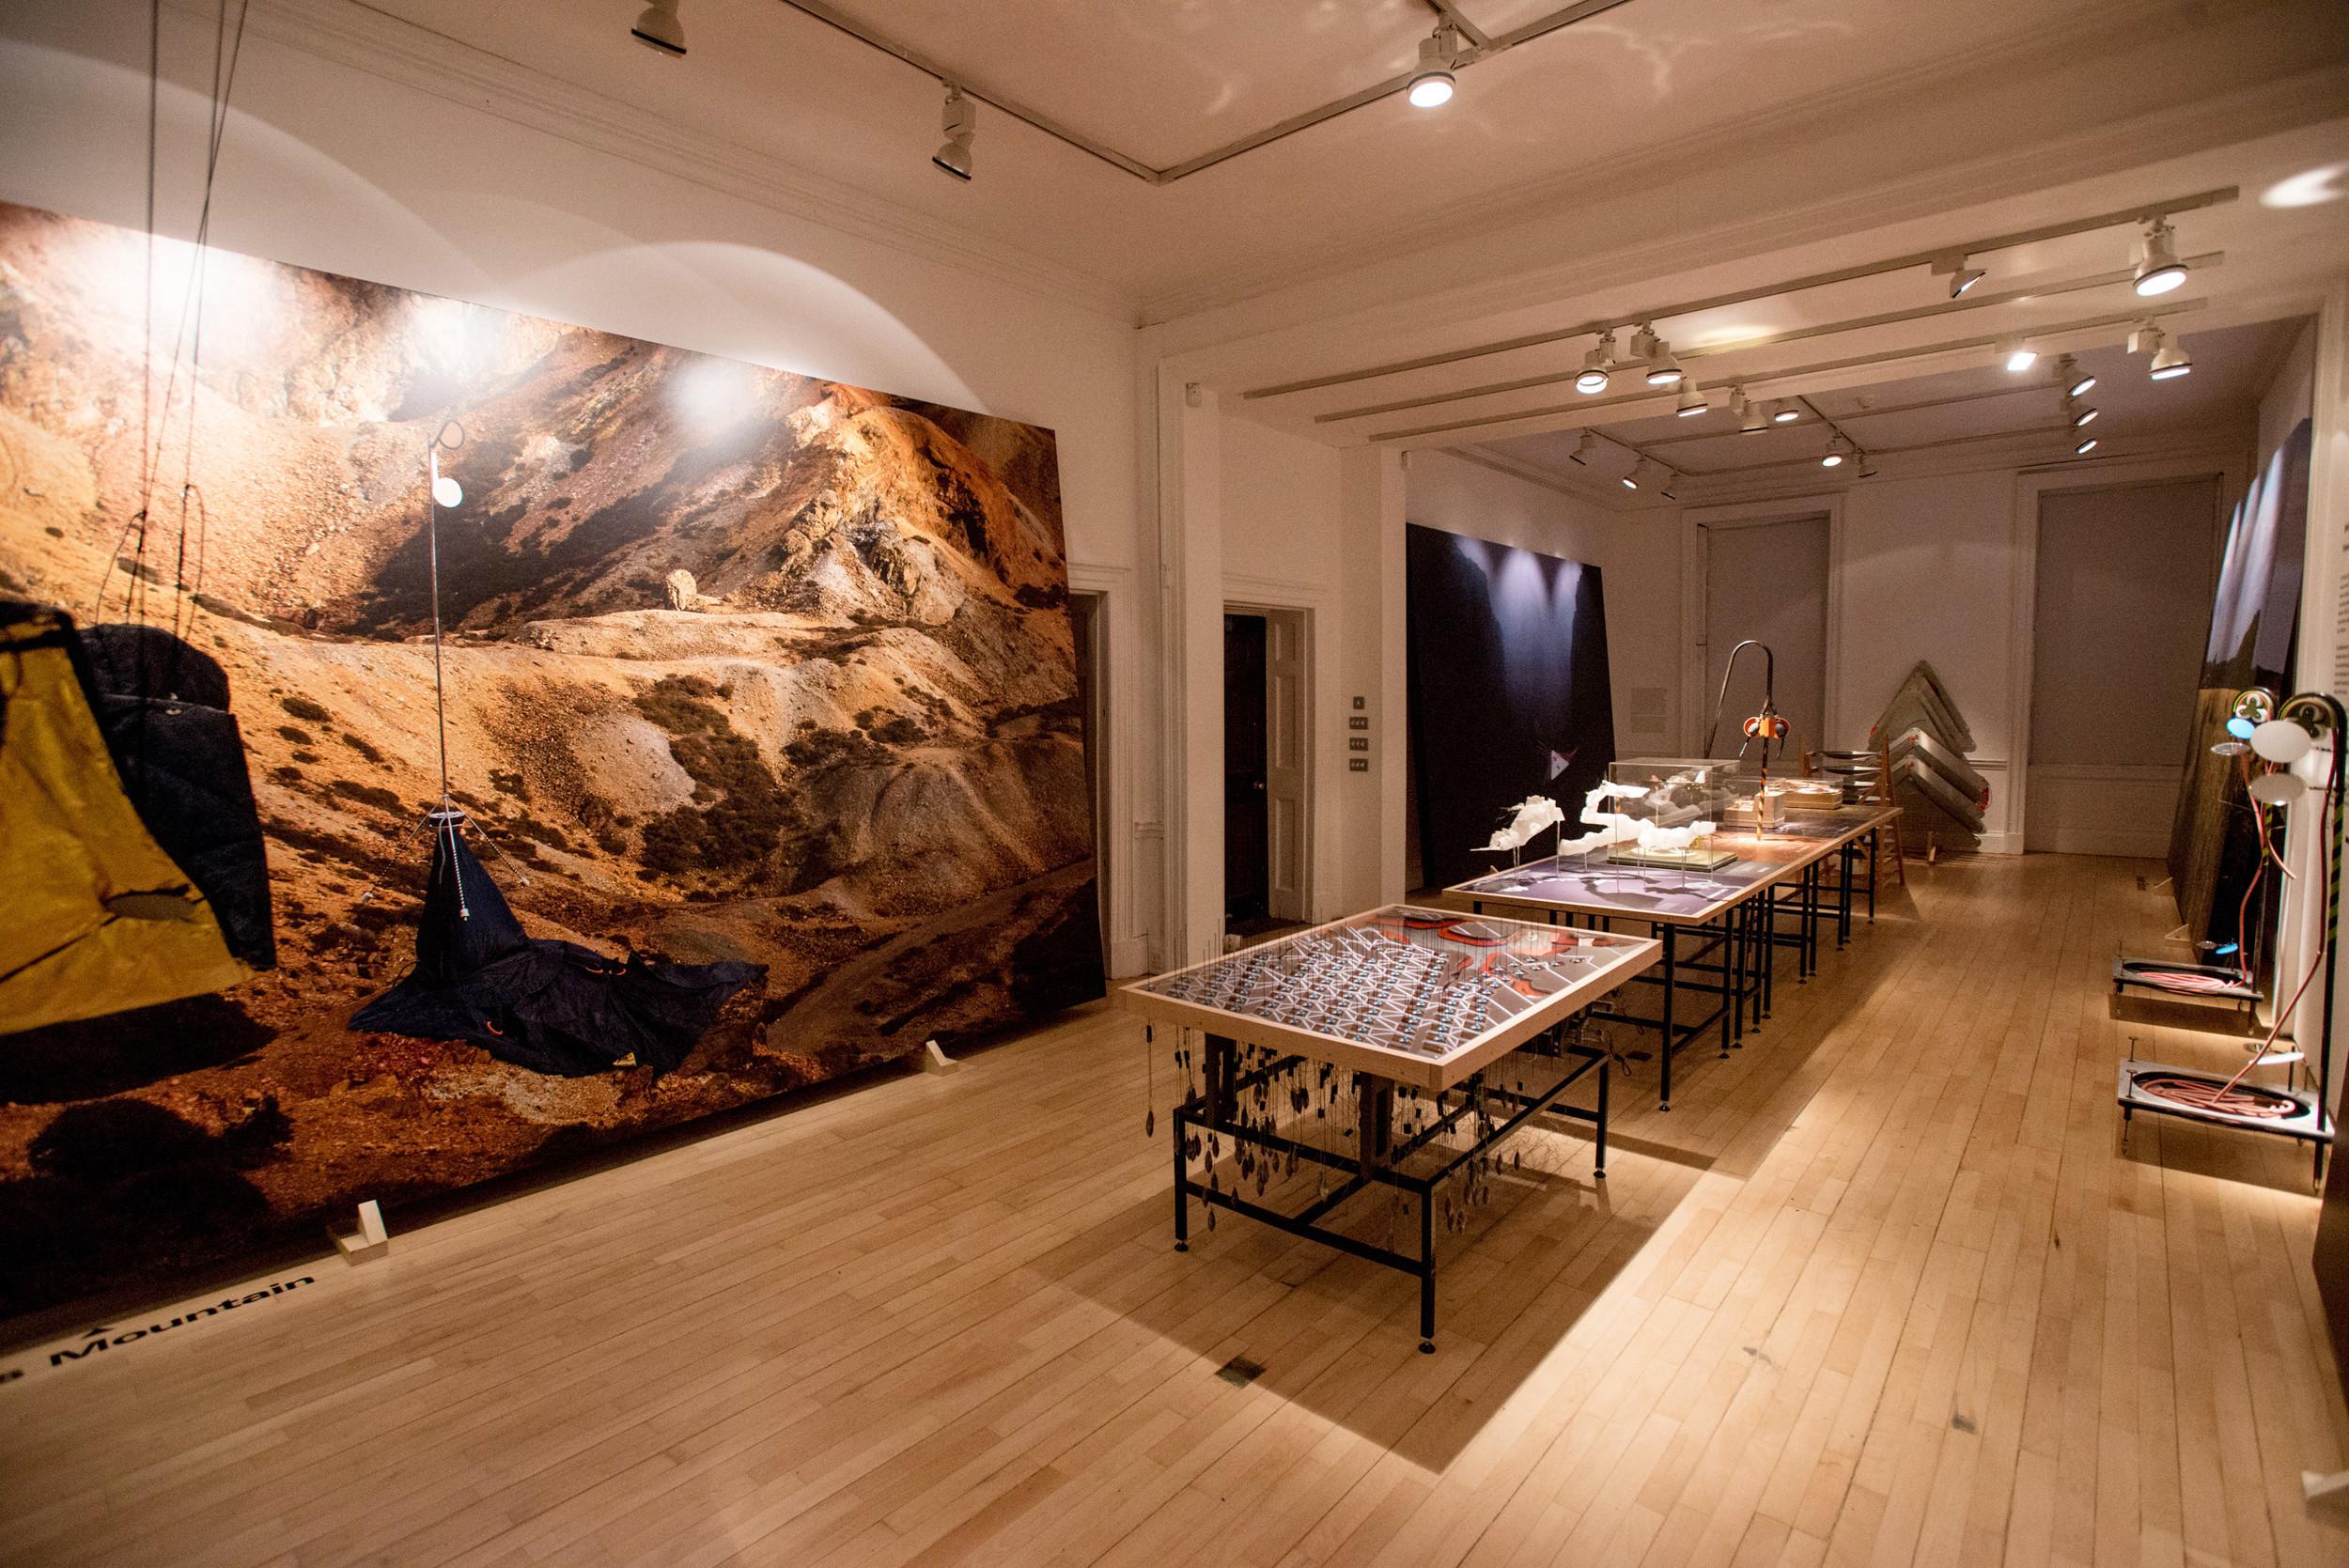 Architectural Exhibition - British Exploratory Land Survey - Smout Allen & Geoff Manaugh